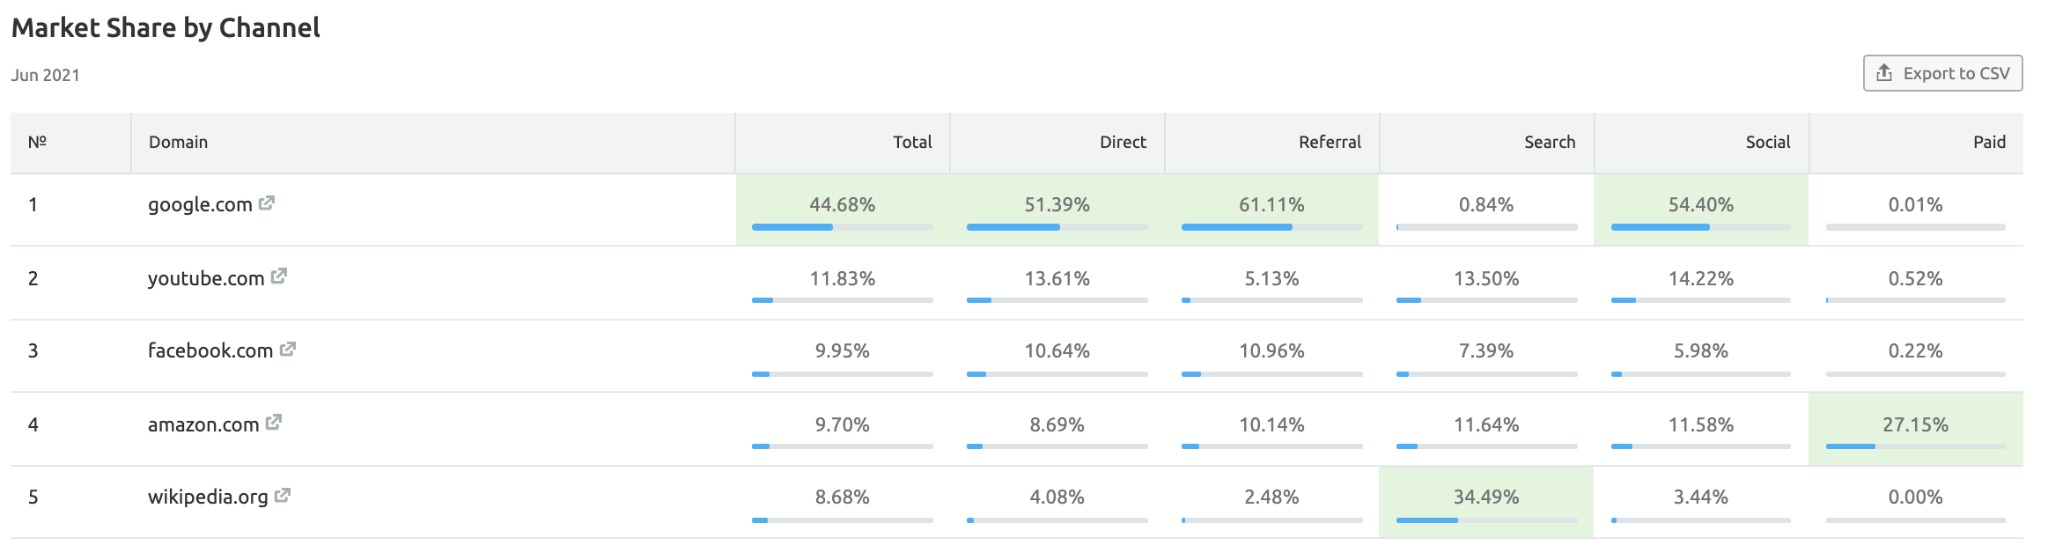 Market Explorer Benchmarking Report image 11